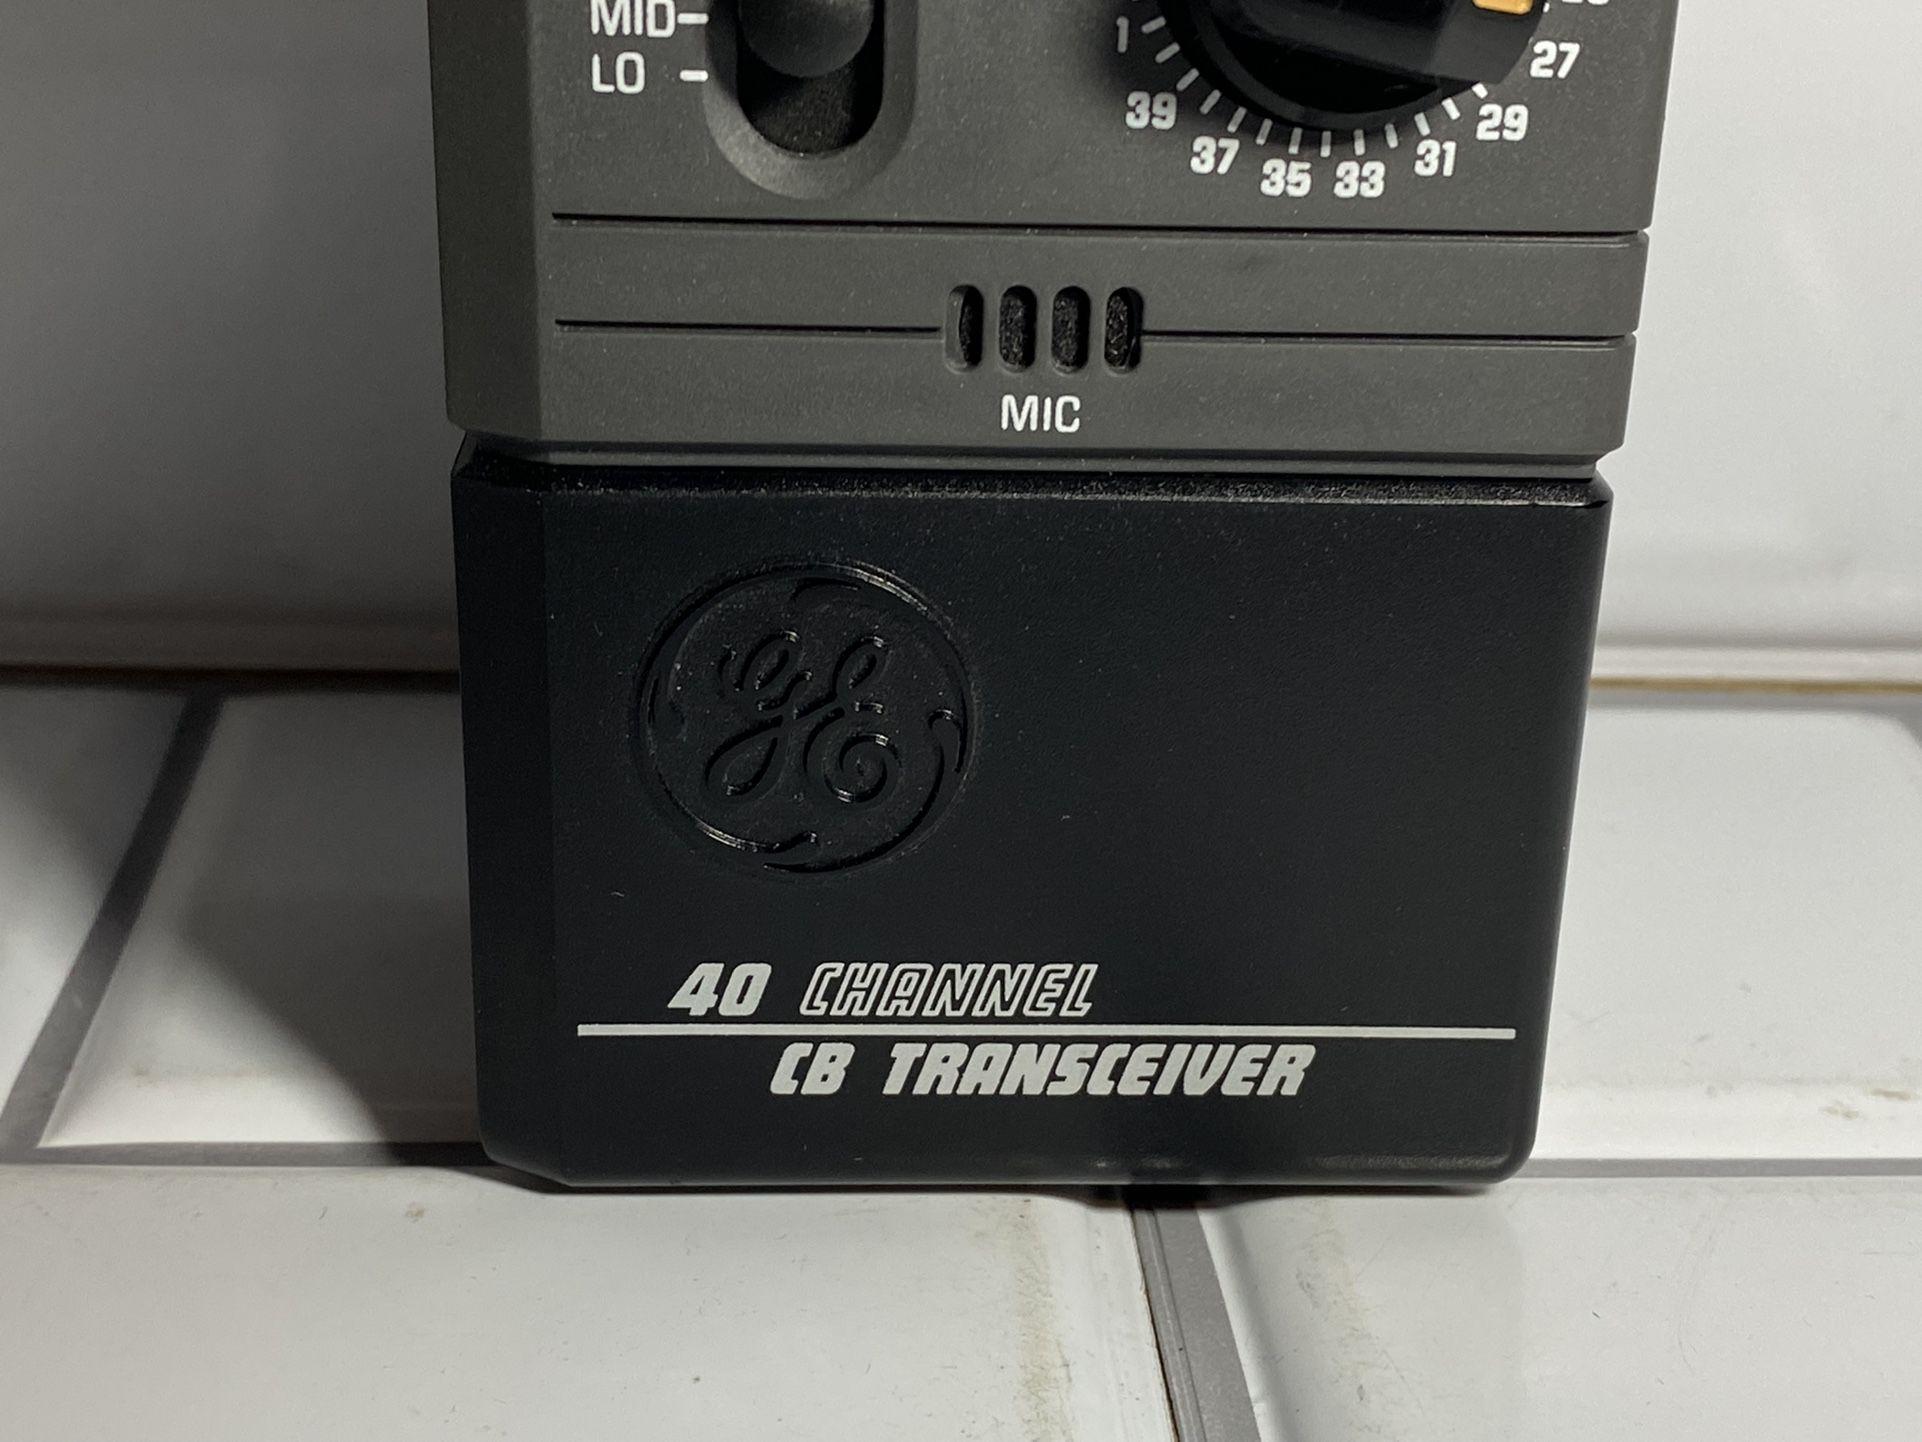 40 channel handheld CB radio GE